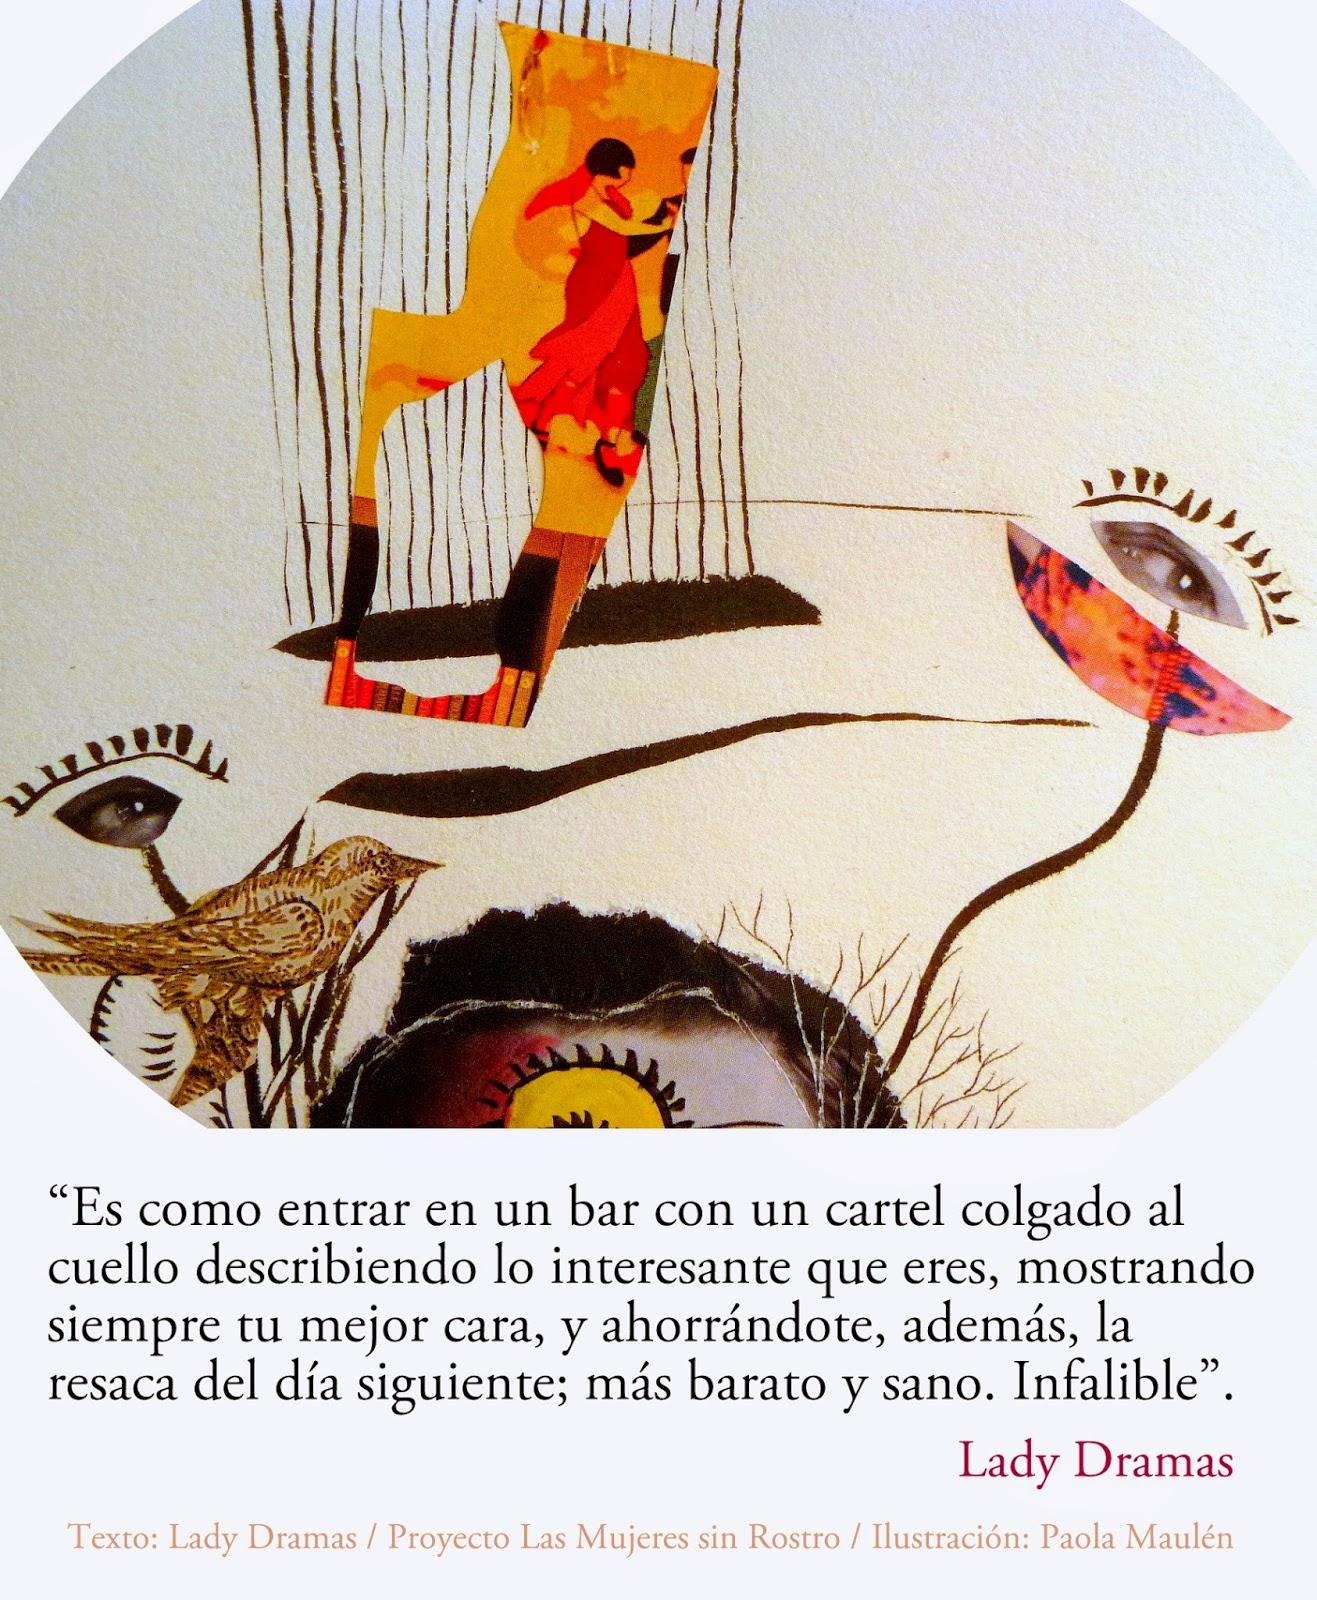 http://lasmujeressinrostro.blogspot.de/p/blog-page_13.html